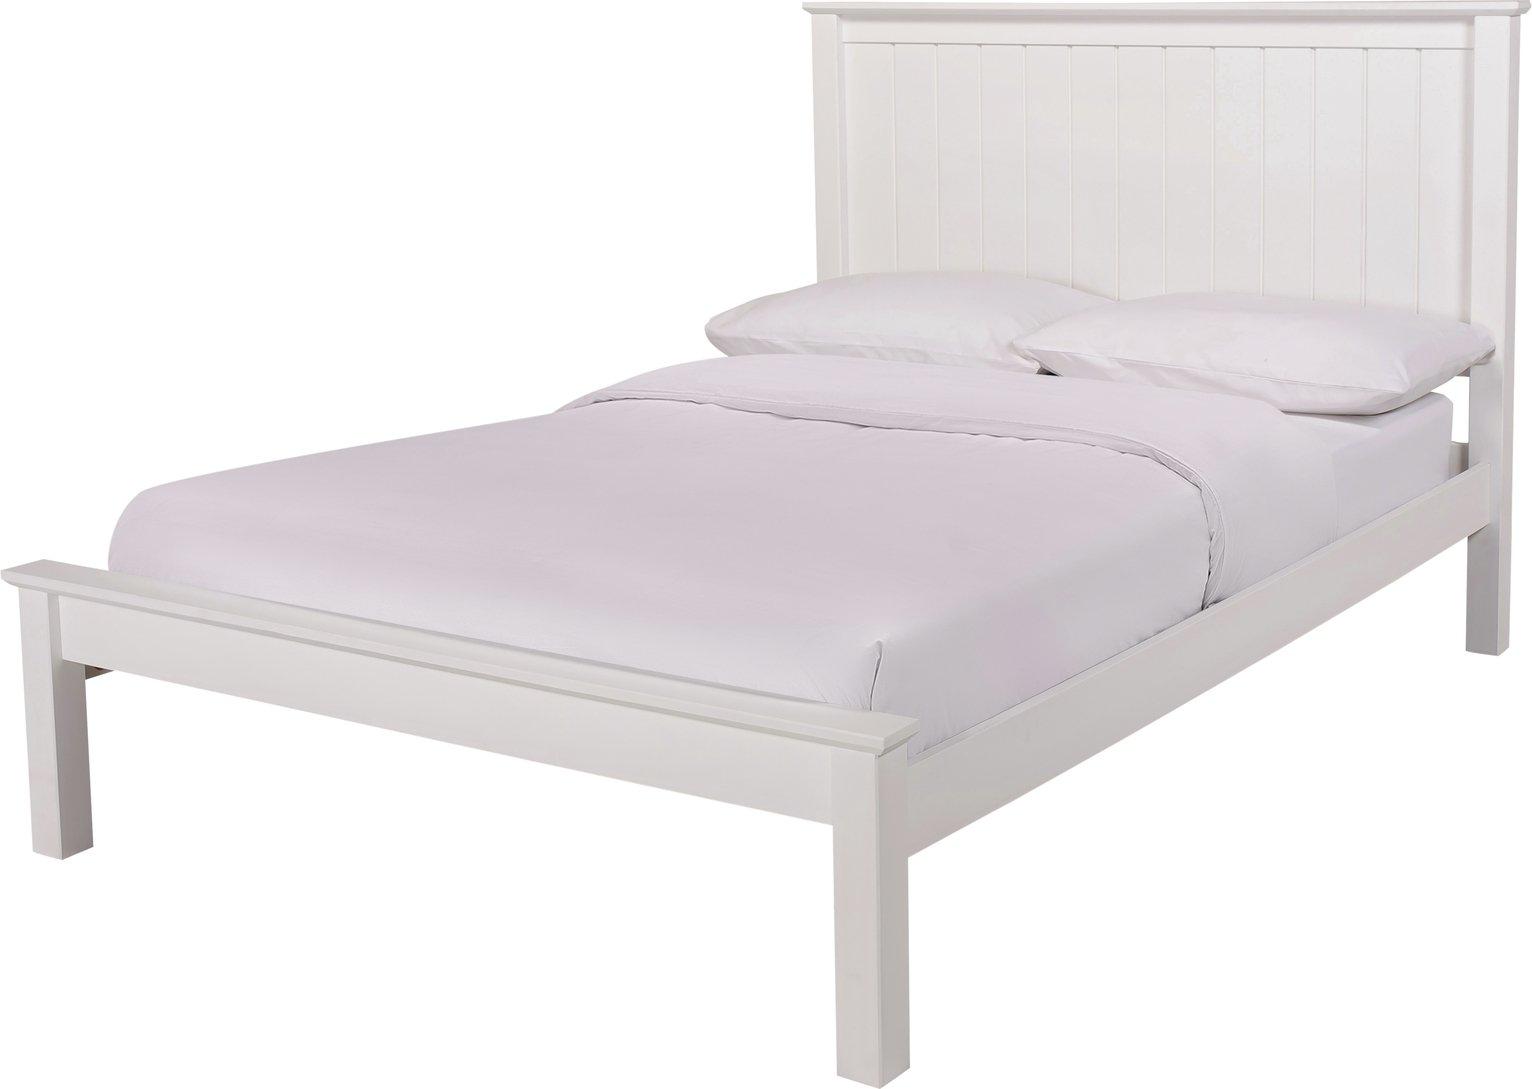 Argos Home Grafton Kingsize Bed Frame - White